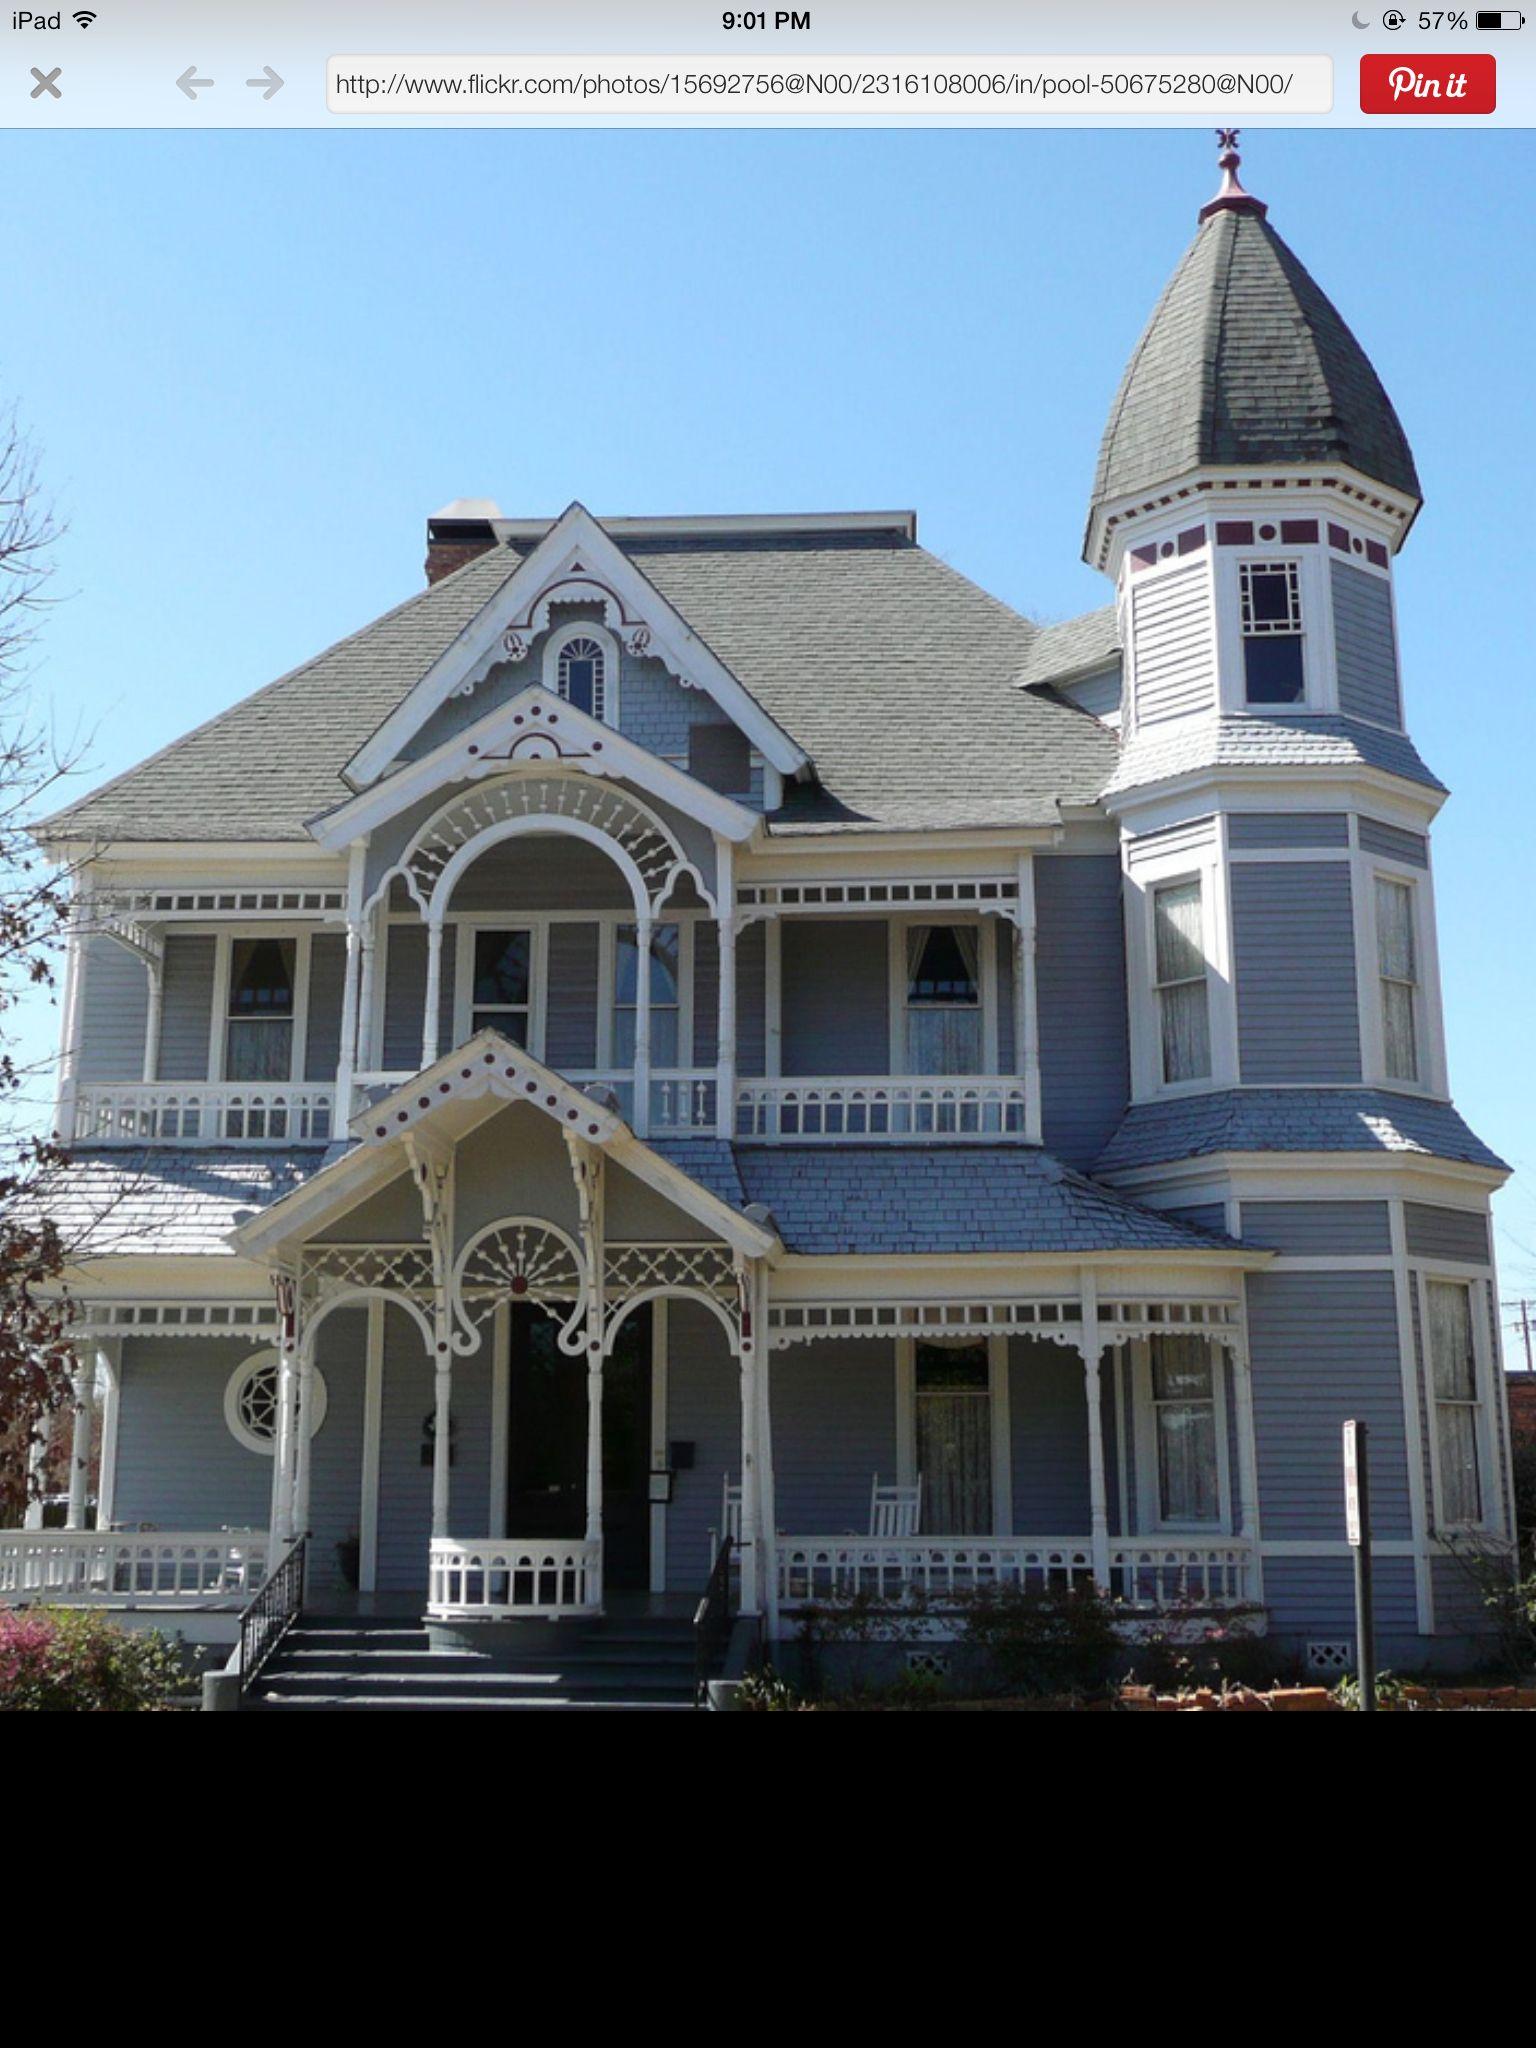 Gingerbread Victorian Exterior House Paint Ideas